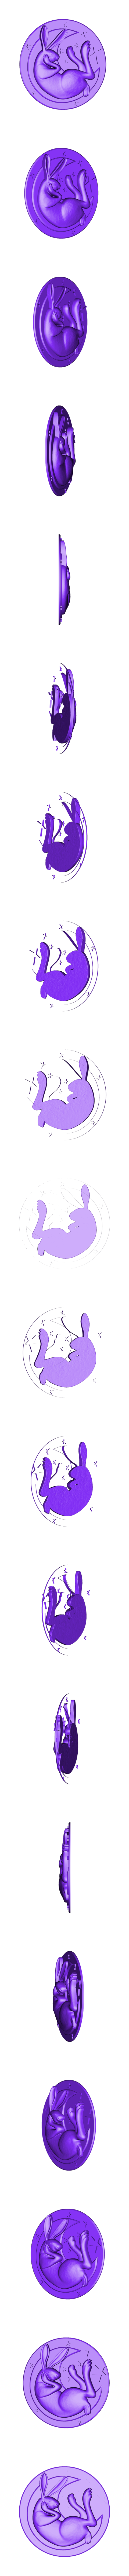 P25.stl Download STL file Bunny • Model to 3D print, 3dmodelsByVadim